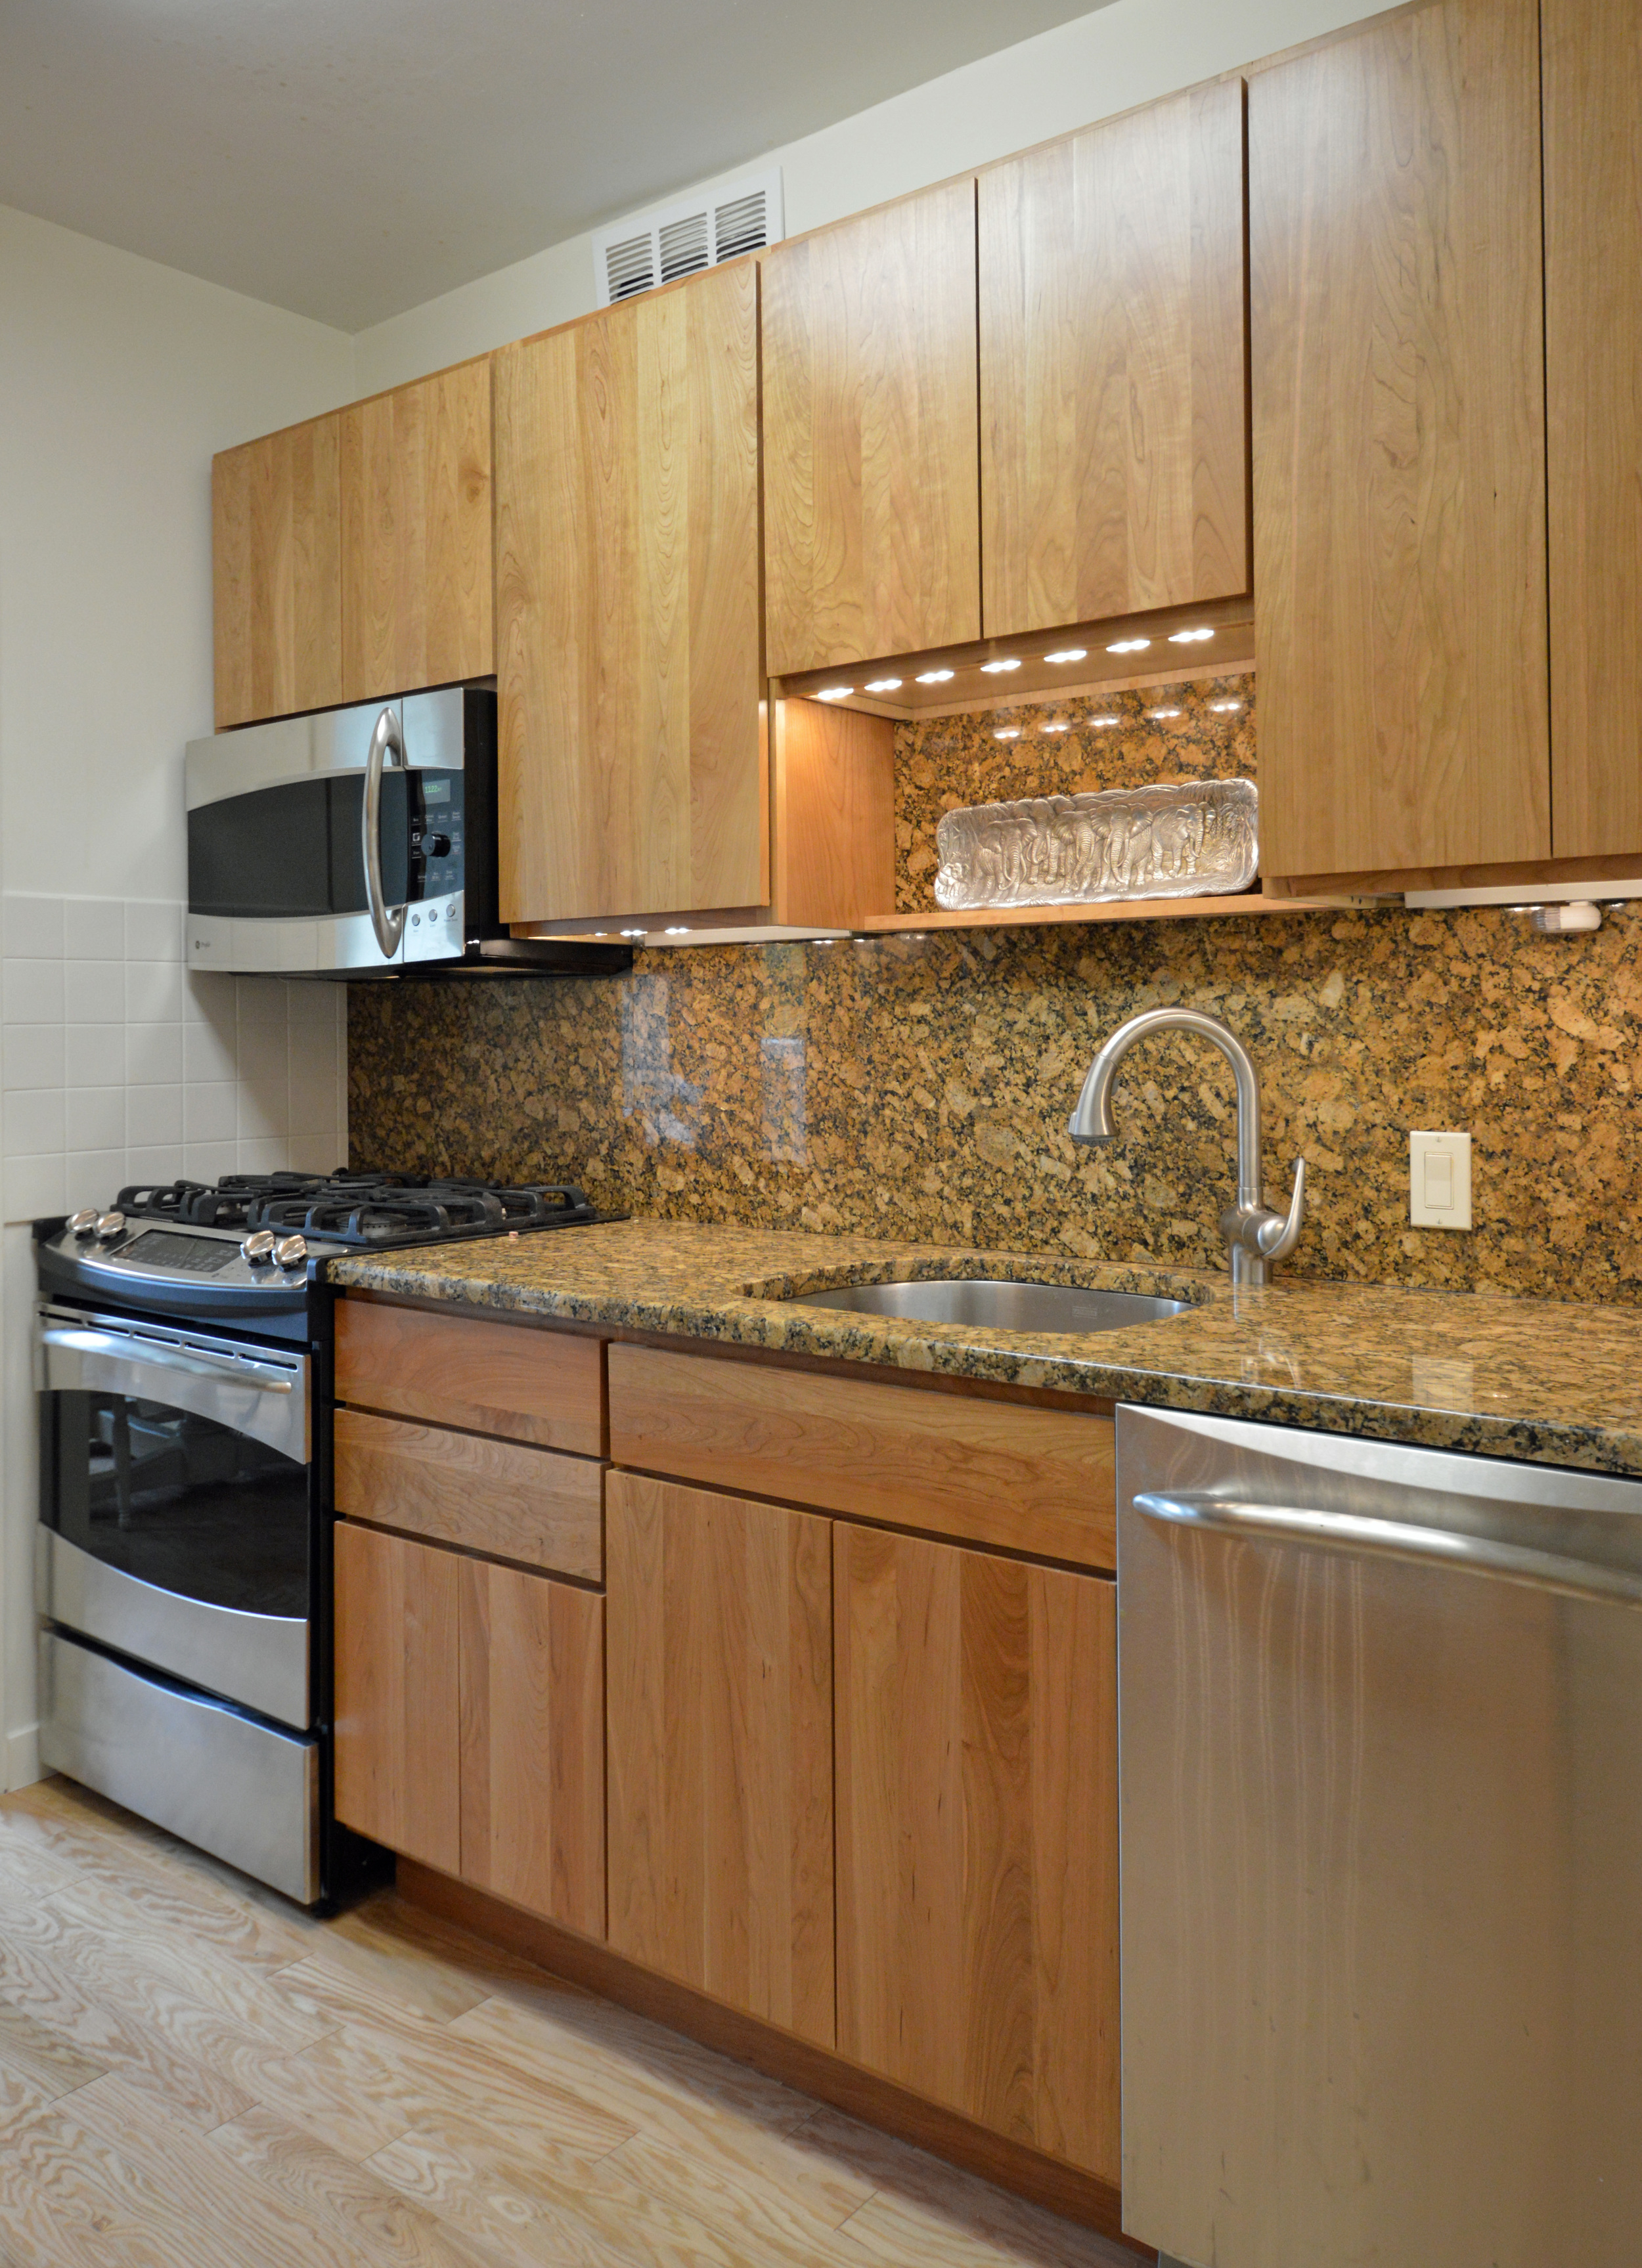 Condo Kitchen renovation in Philadelphia, PA